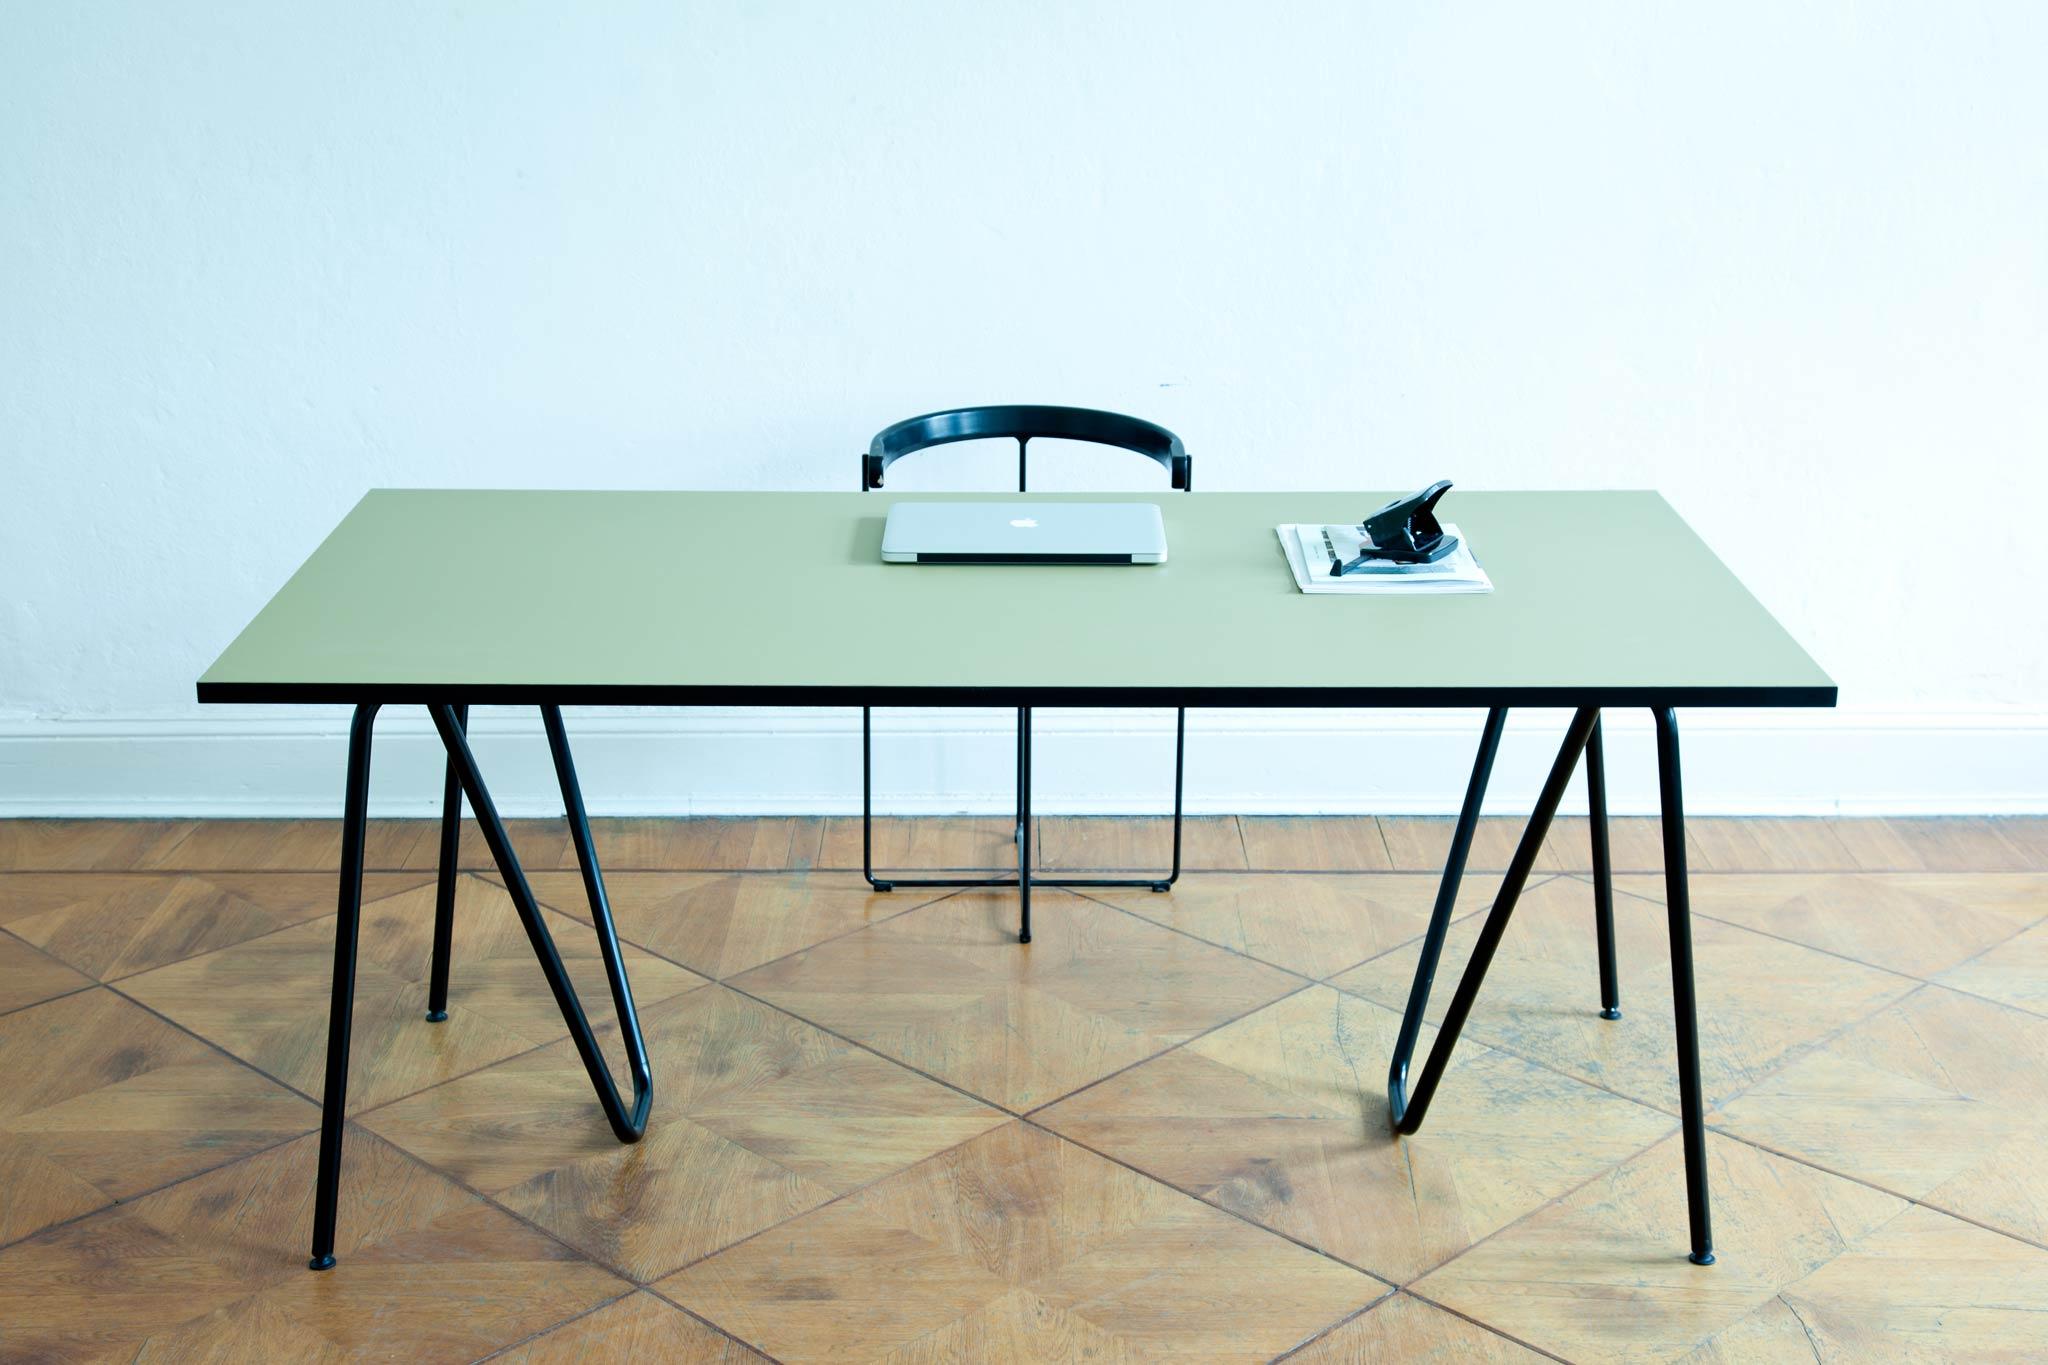 metall tisch nach mass wohn design. Black Bedroom Furniture Sets. Home Design Ideas